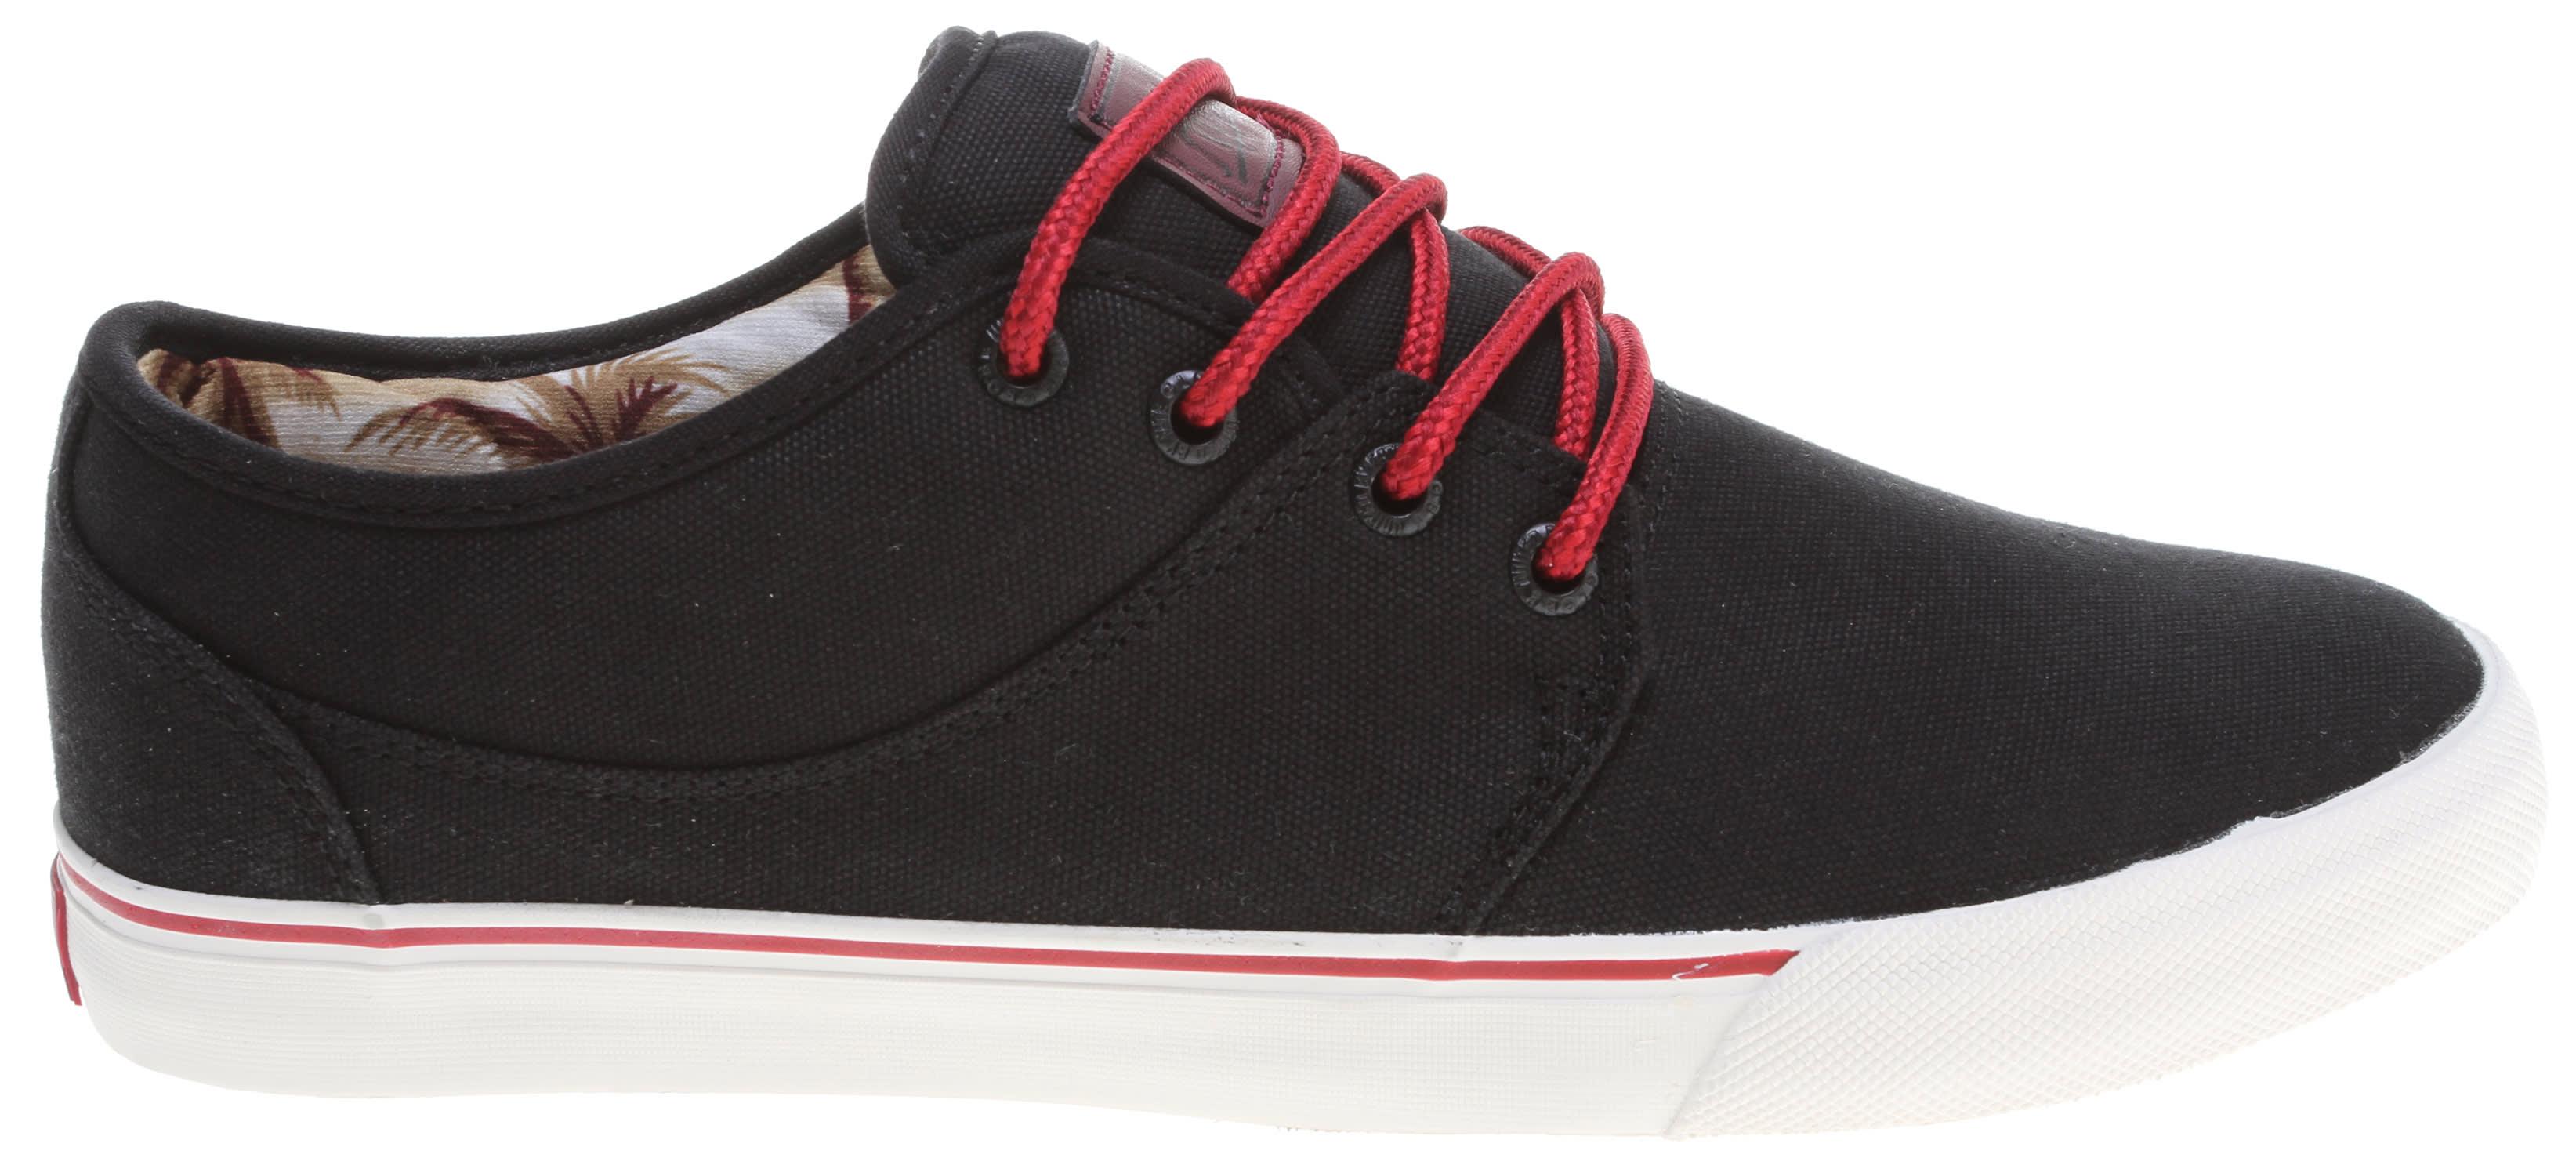 Mens Mahalo Skateboarding Shoes Globe H48TtQ0